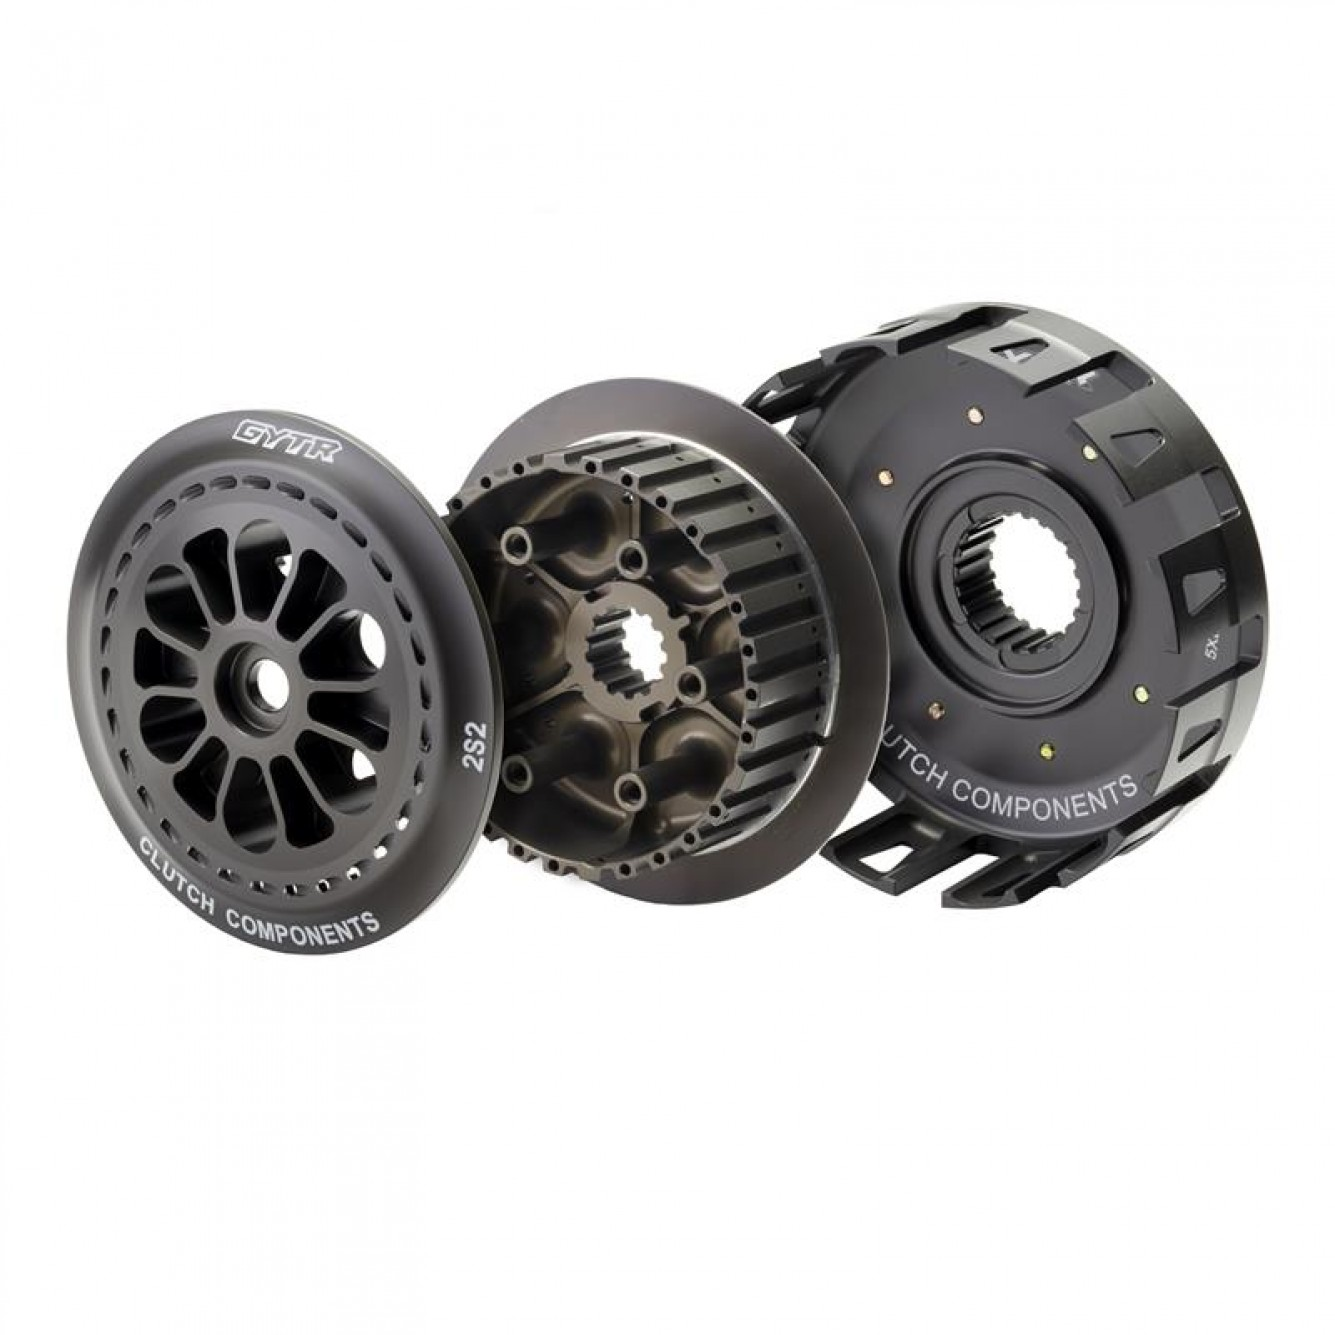 Yamaha | GYTR Billet Koppelingsbinnennaaf